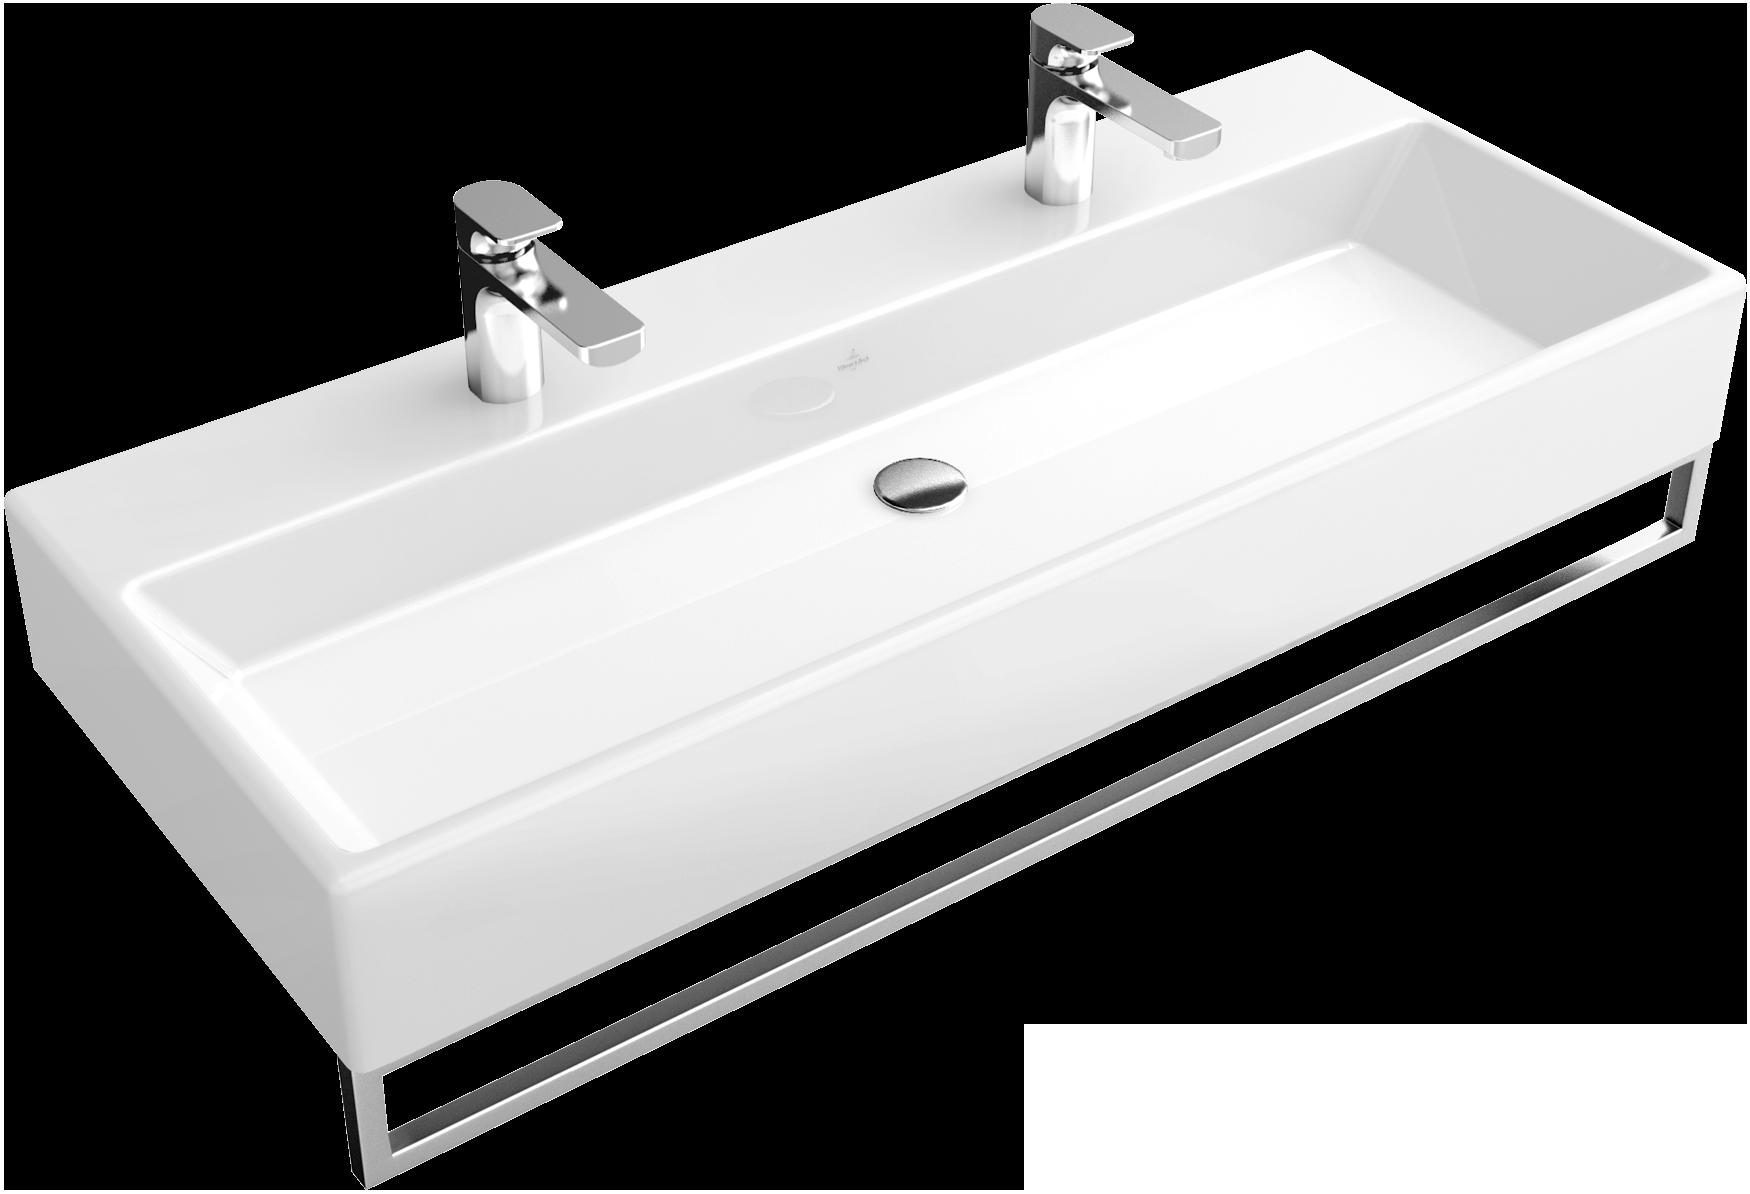 Memento Bathroom furniture  Small piece of furniture  Accessories. Memento Towel holder 874912   Villeroy   Boch